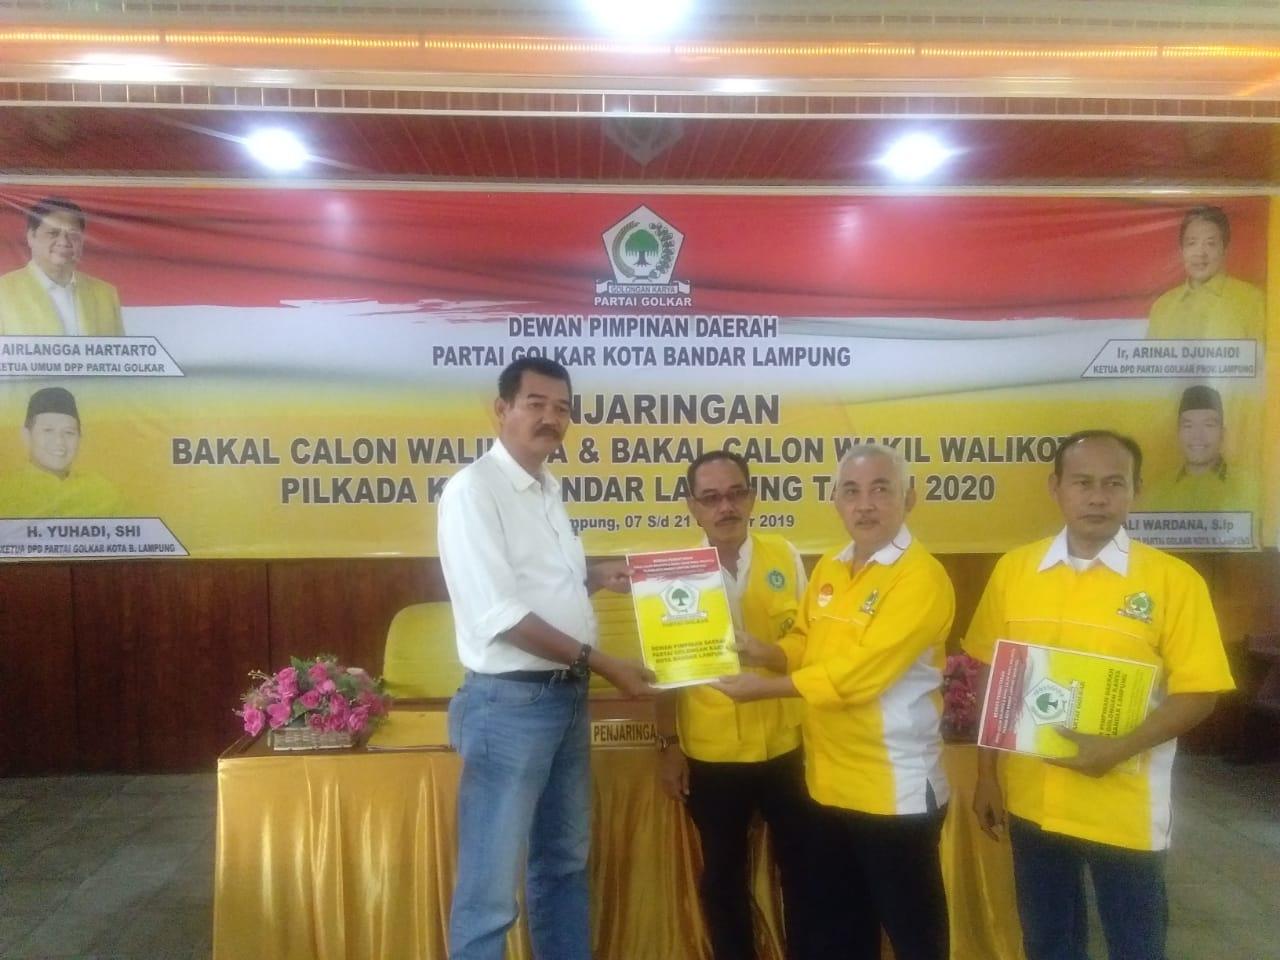 Arifin Sebut Dibawah Kepemimpinan H.Riza Mirhadi Kota Bandar Lampung Akan Jadi Ibukota Provinsi Lampung Yang Aman, Maju, Mandiri dan Sejahtera